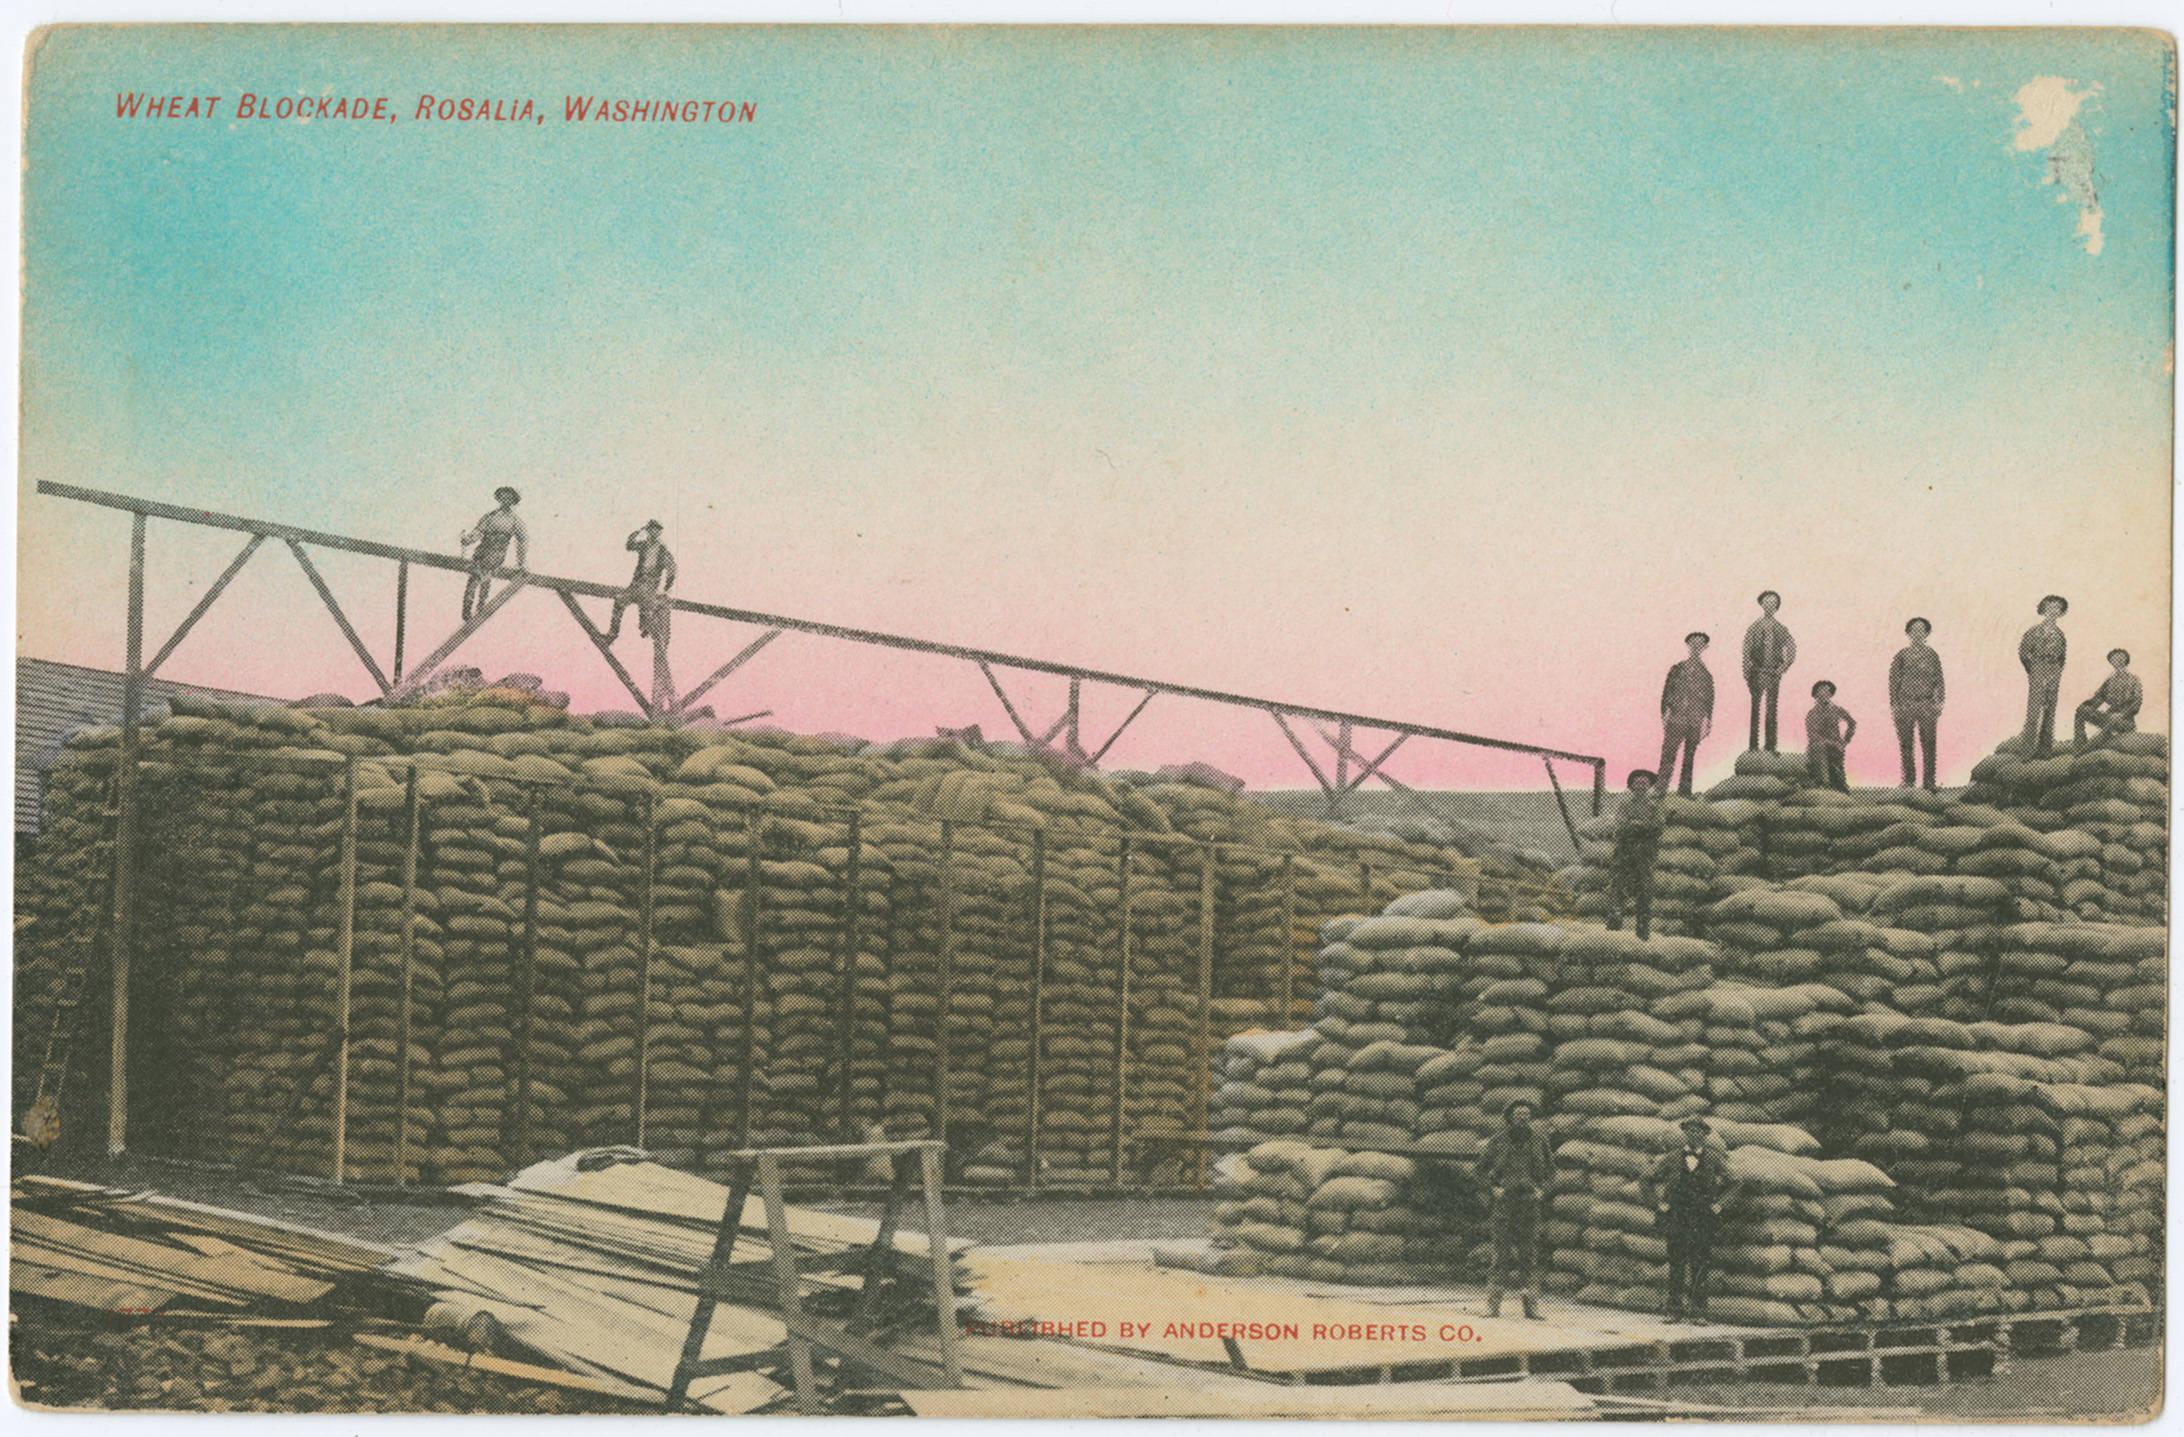 Wheat_blockade_Rosalia_Washington_circa_1910